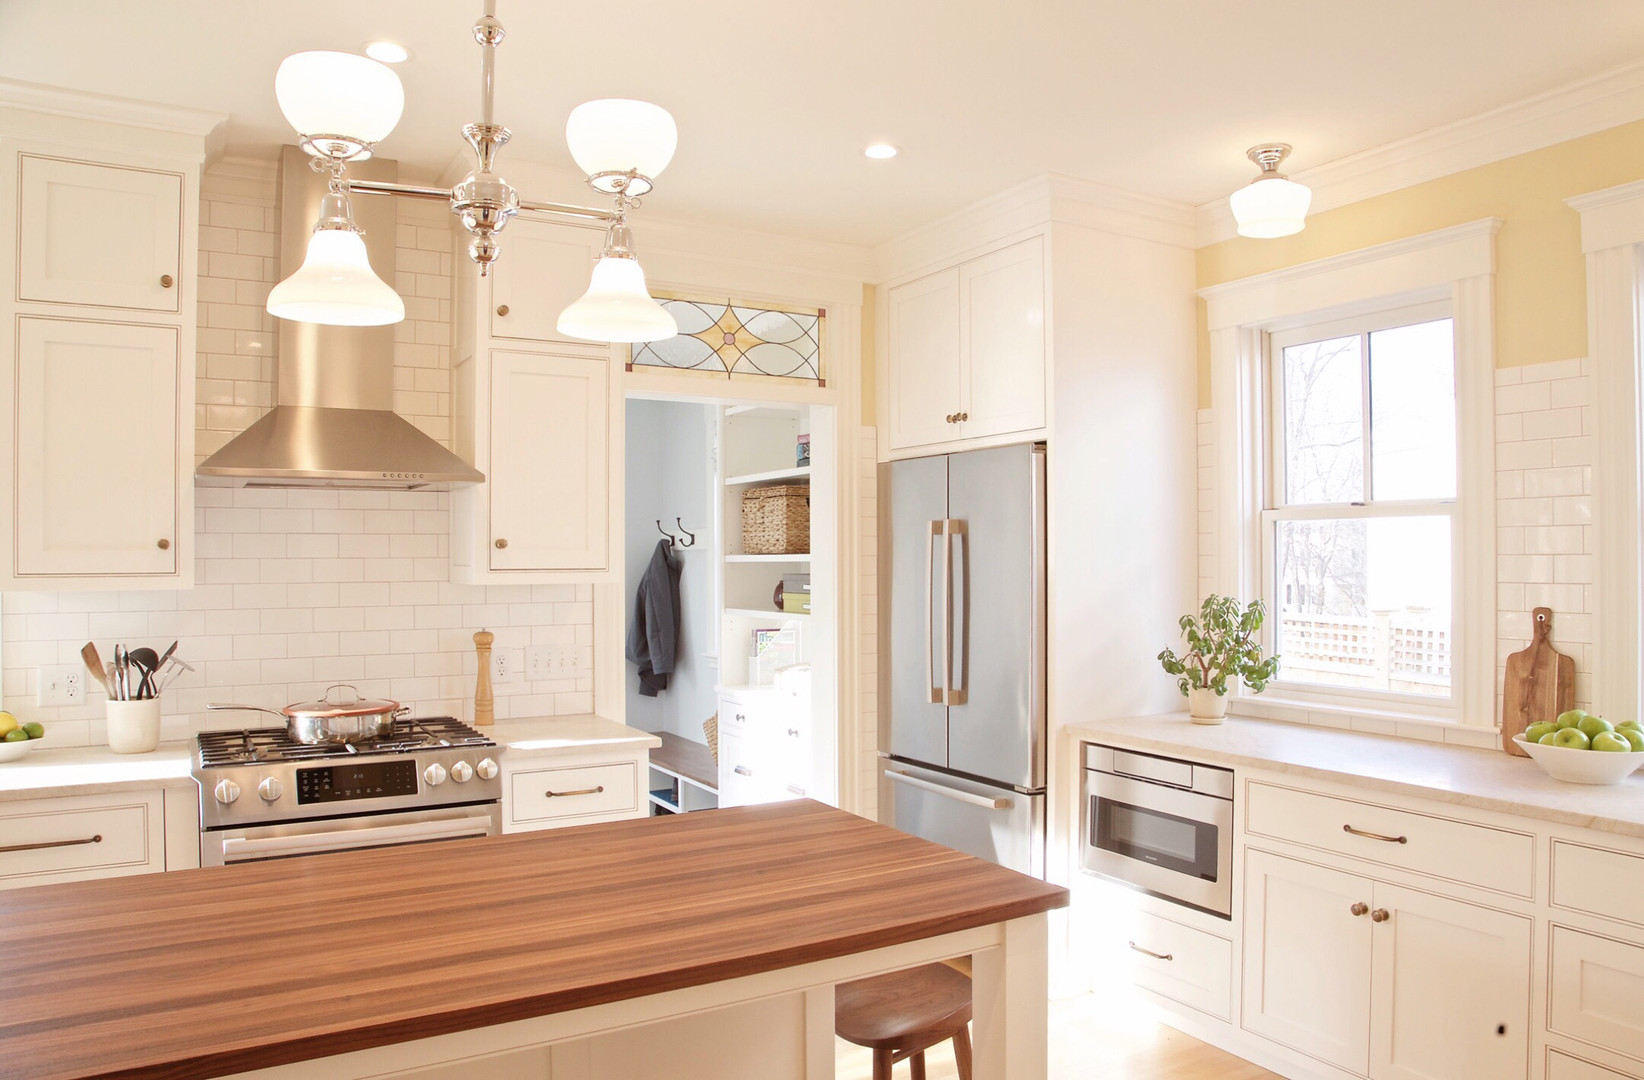 Kitchen Addition & Renovation